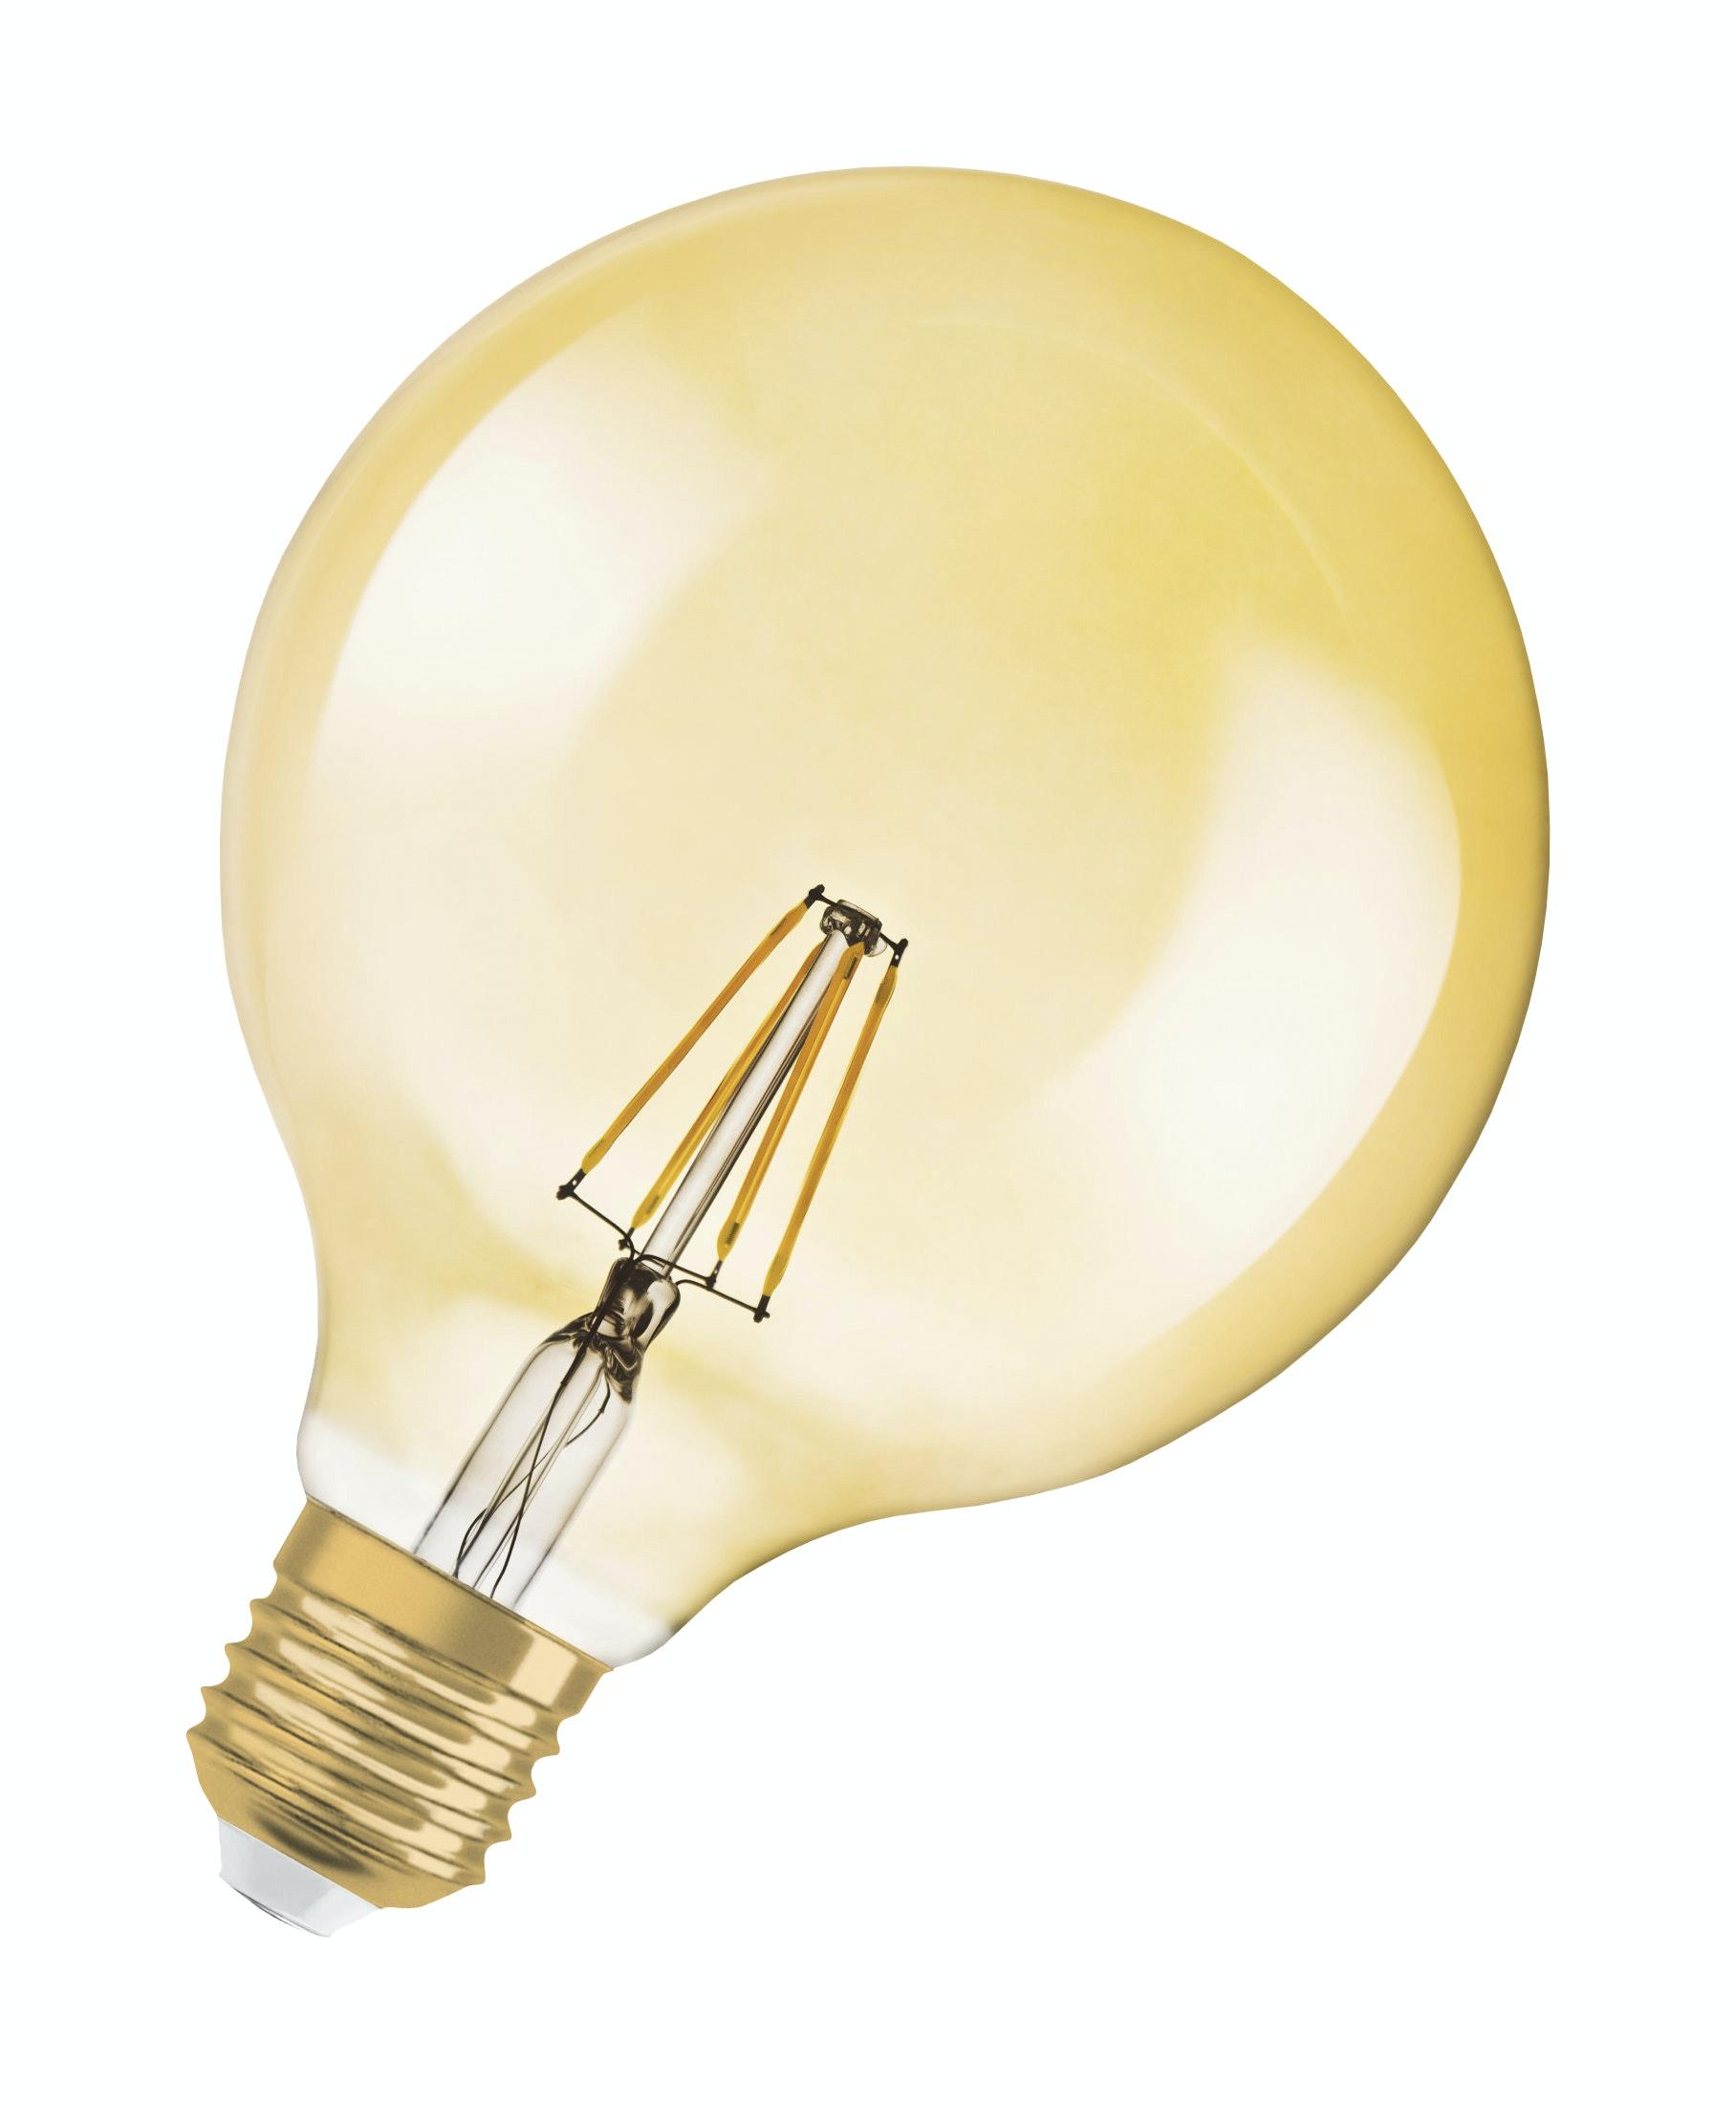 Led-lampa Osram Vintage 1906 Glob 54 710LM/827 E27 Filament Guld Dimbar